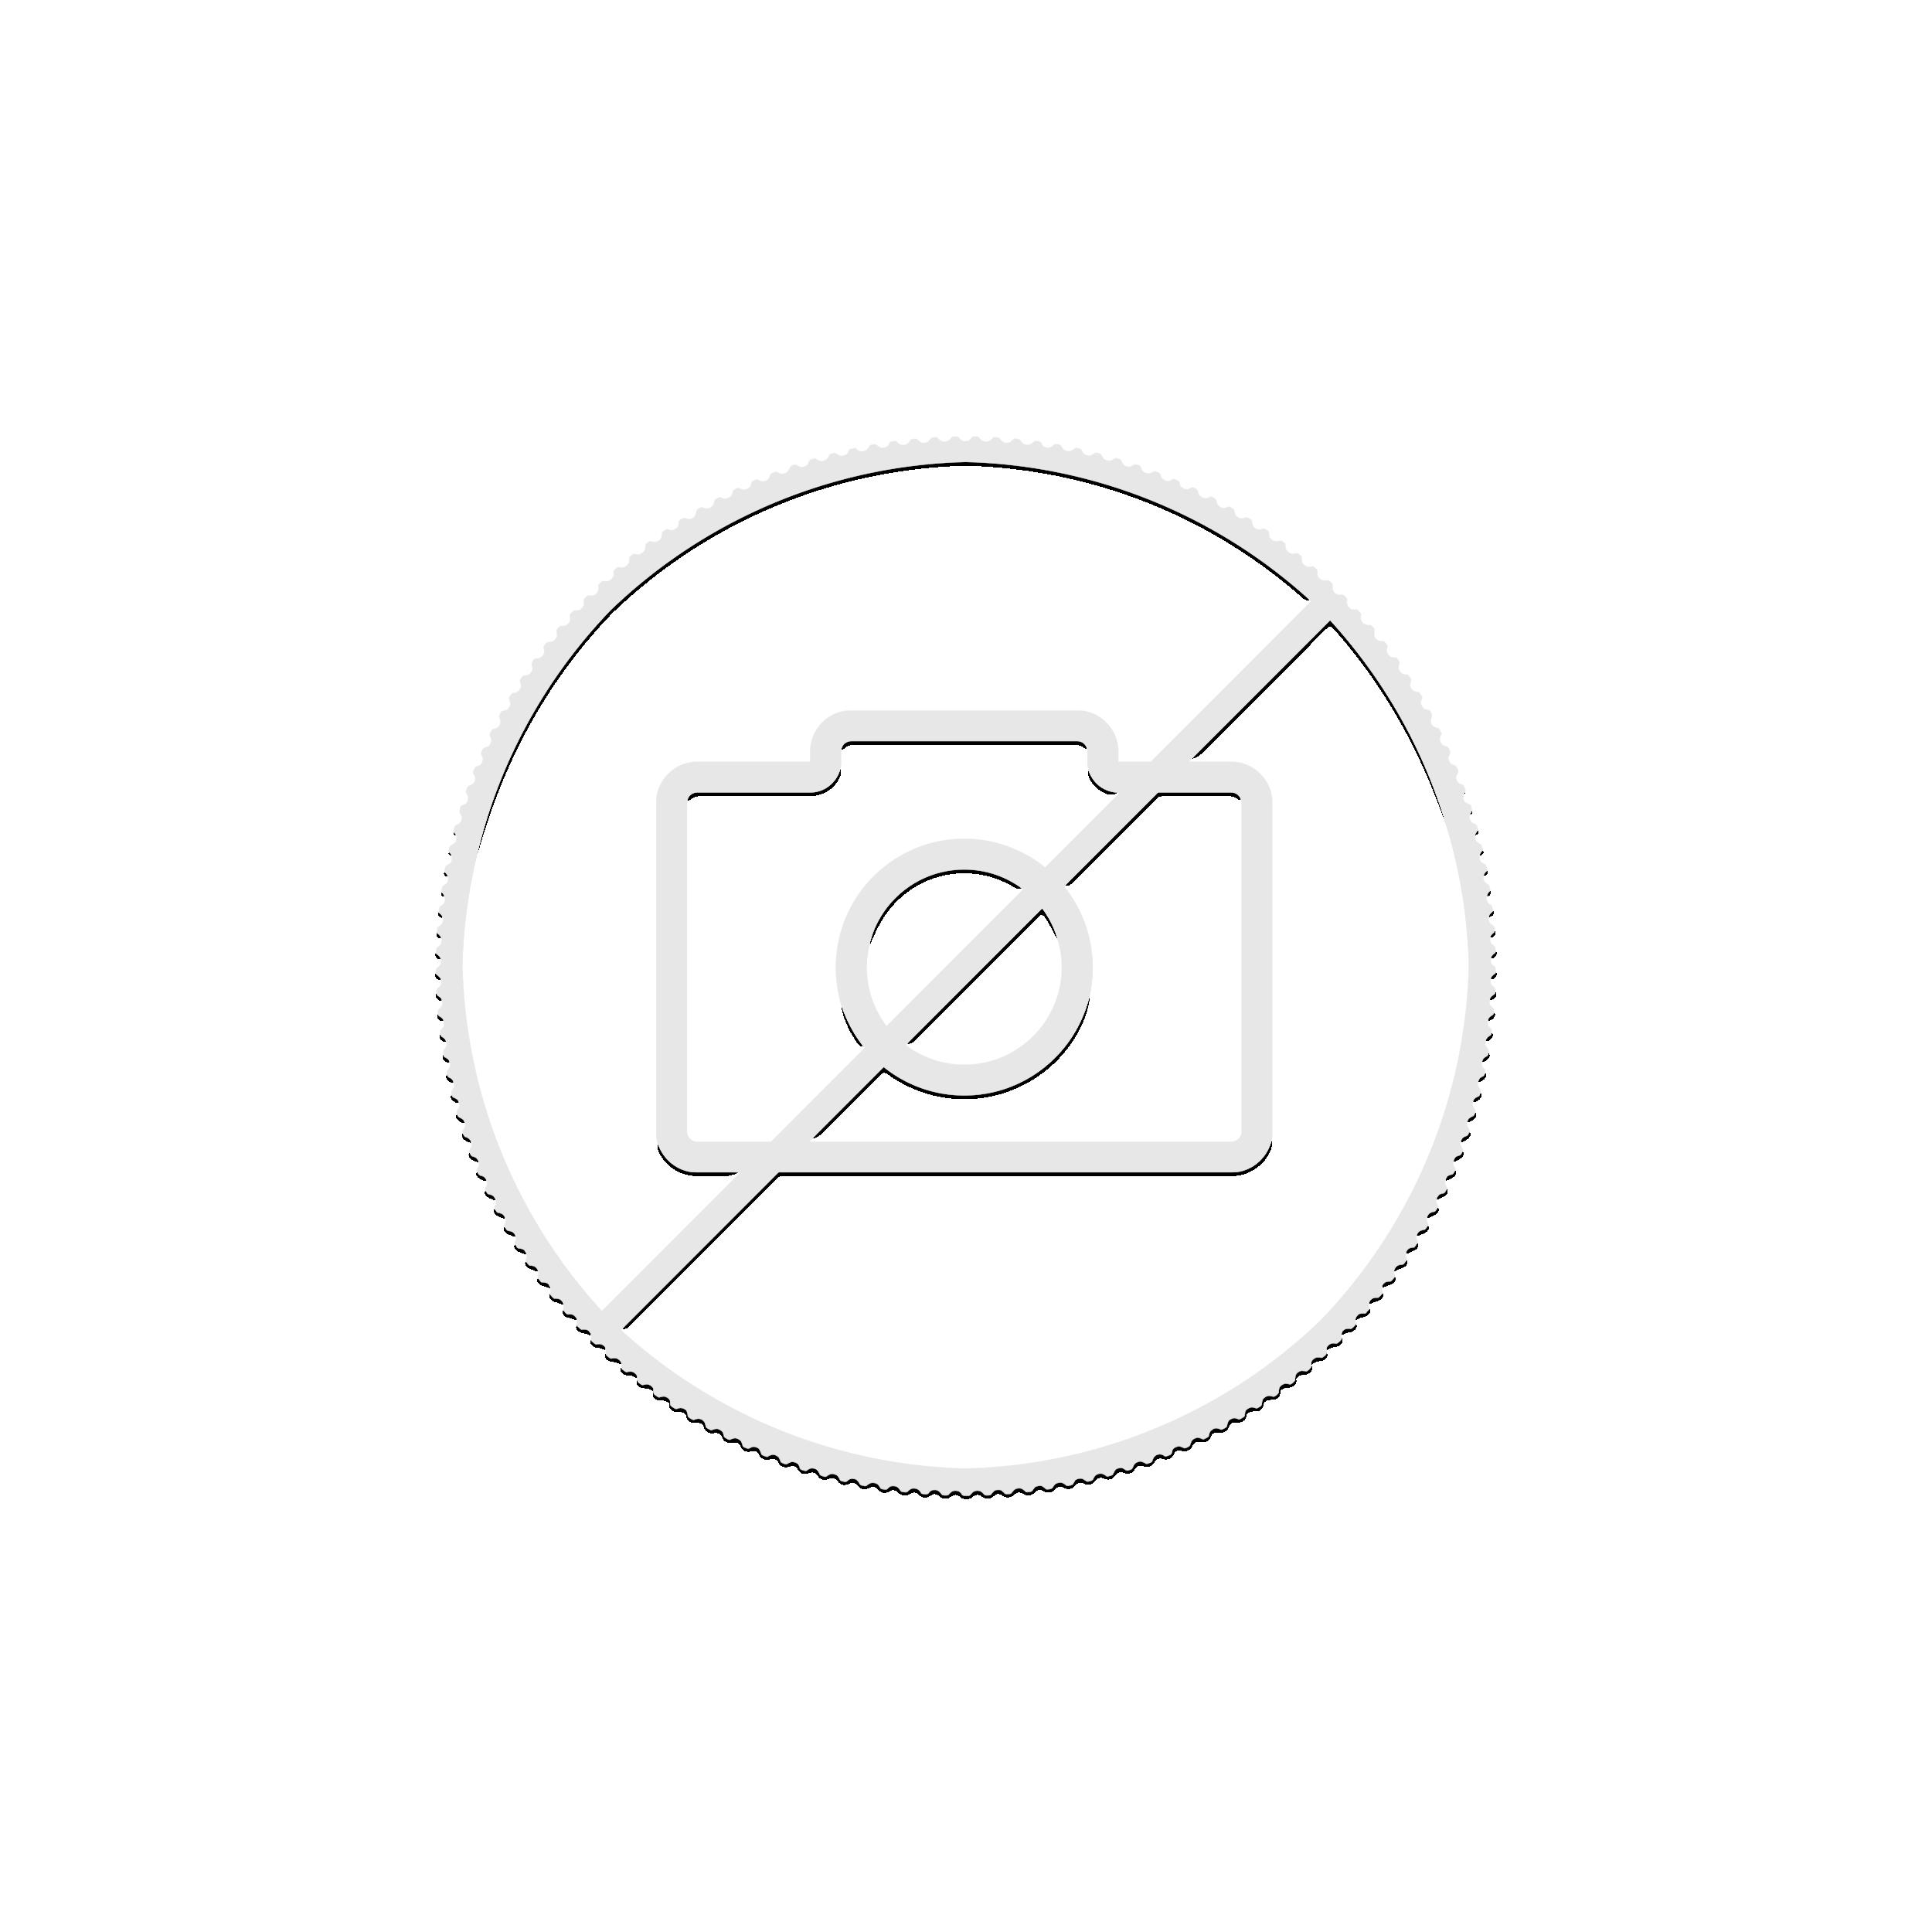 1 troy ounce zilveren Britannia munt 2021